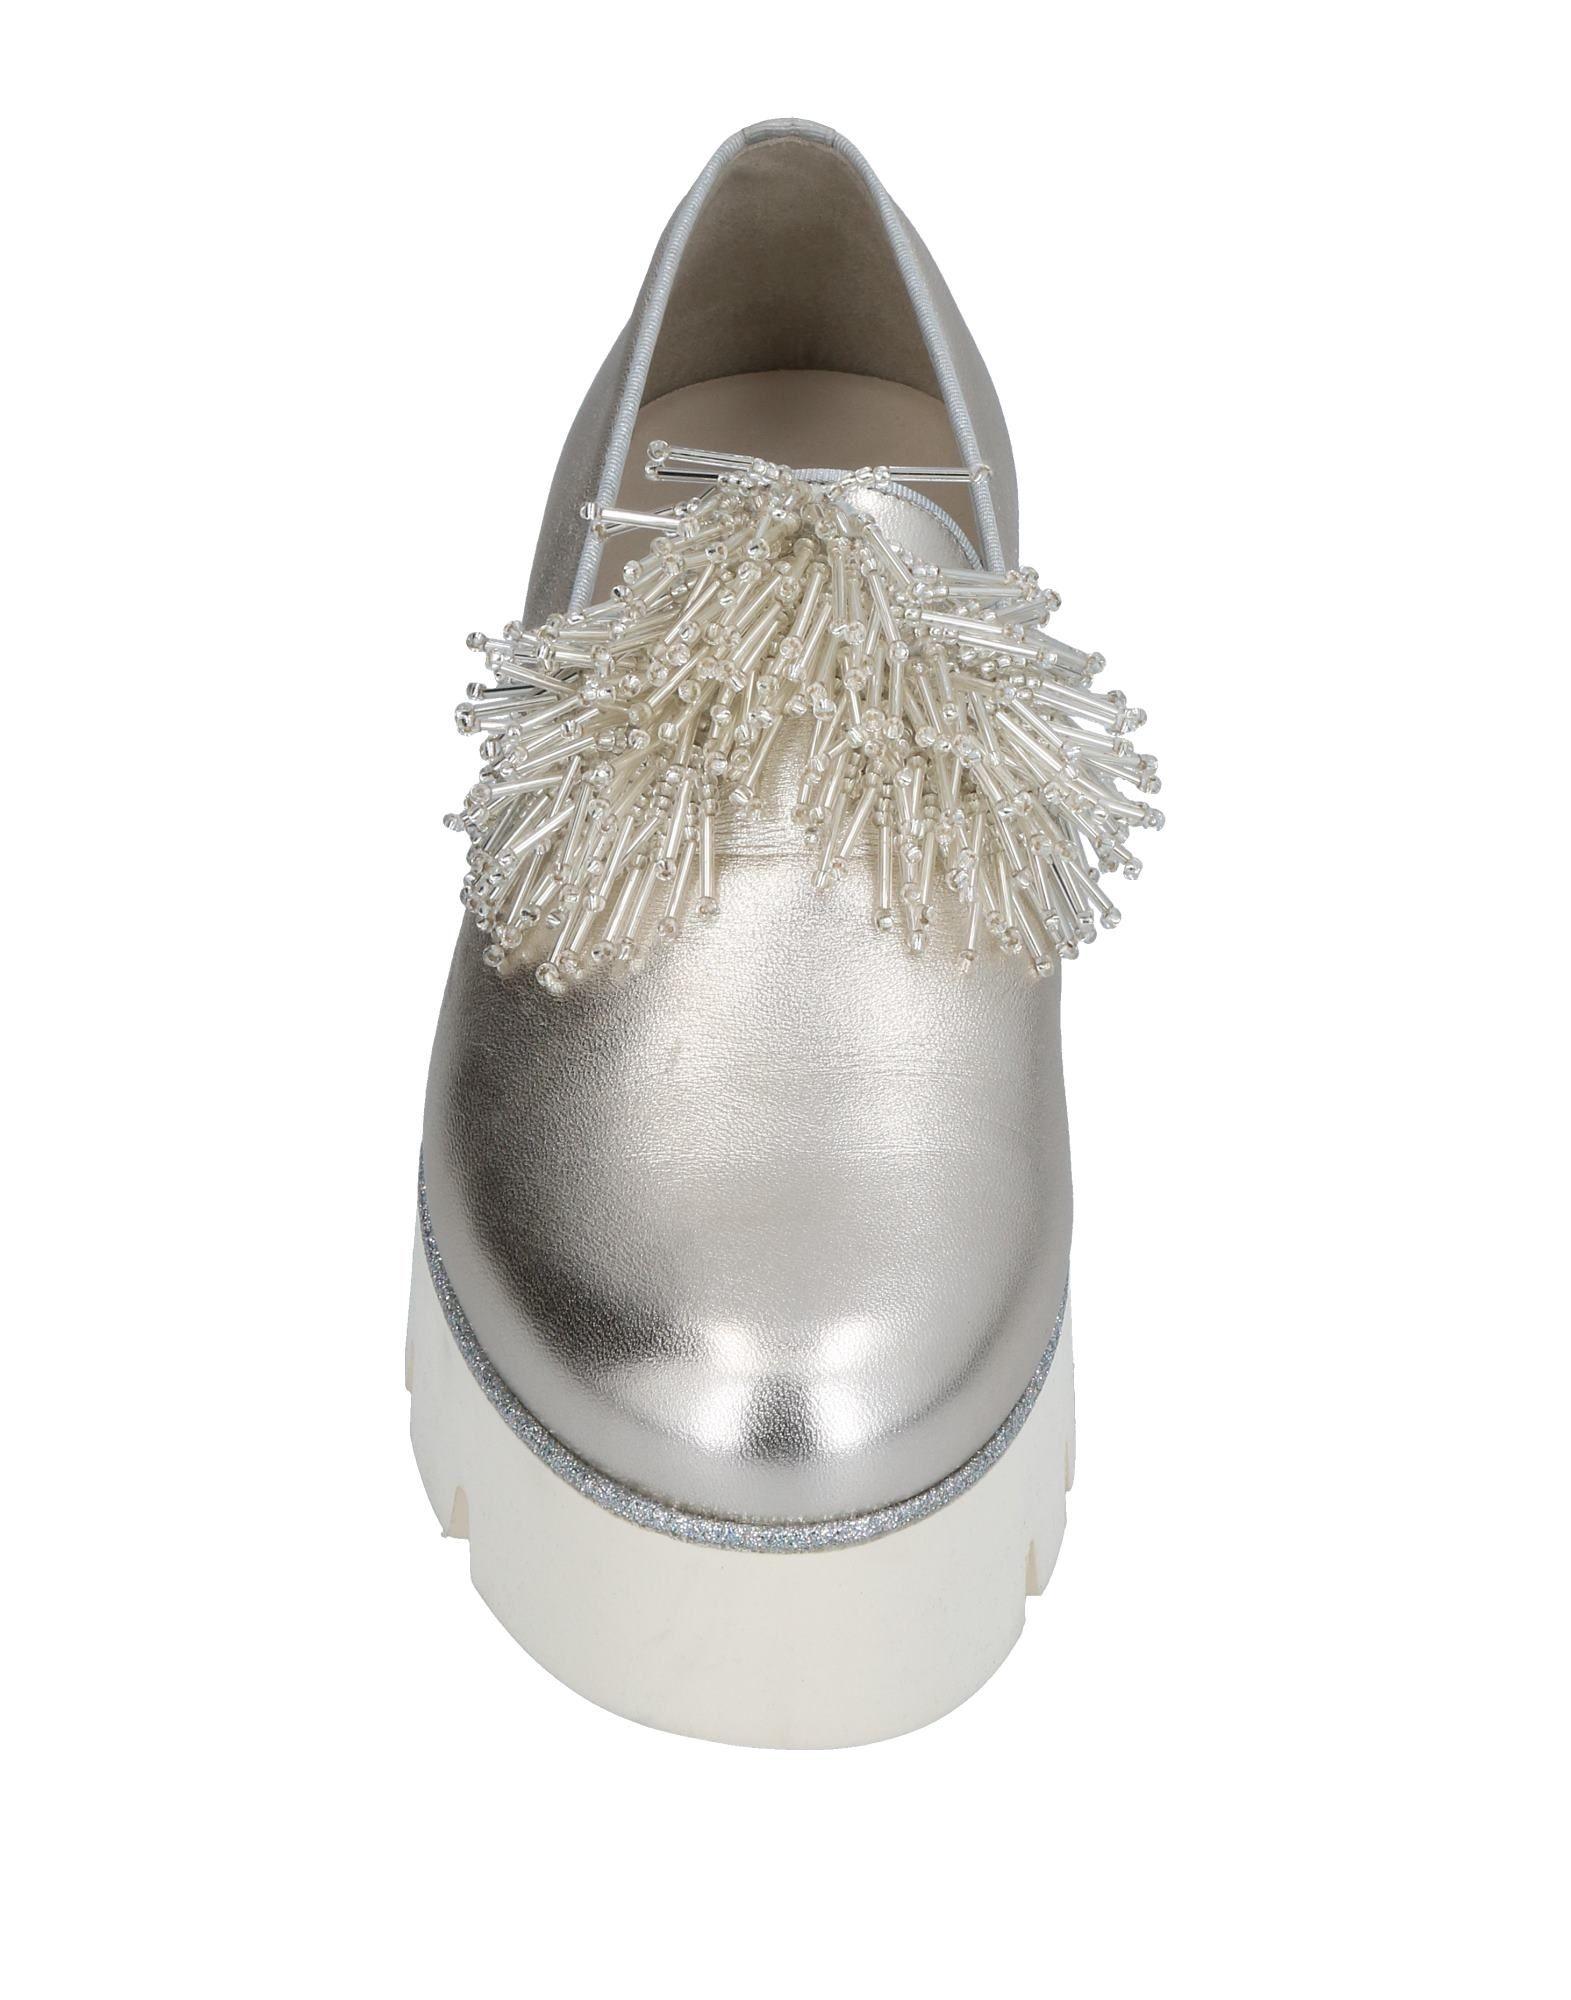 181 By Alberto Gozzi Schuhe Turnschuhes Damen 11391539GCGut aussehende strapazierfähige Schuhe Gozzi 7aecf8